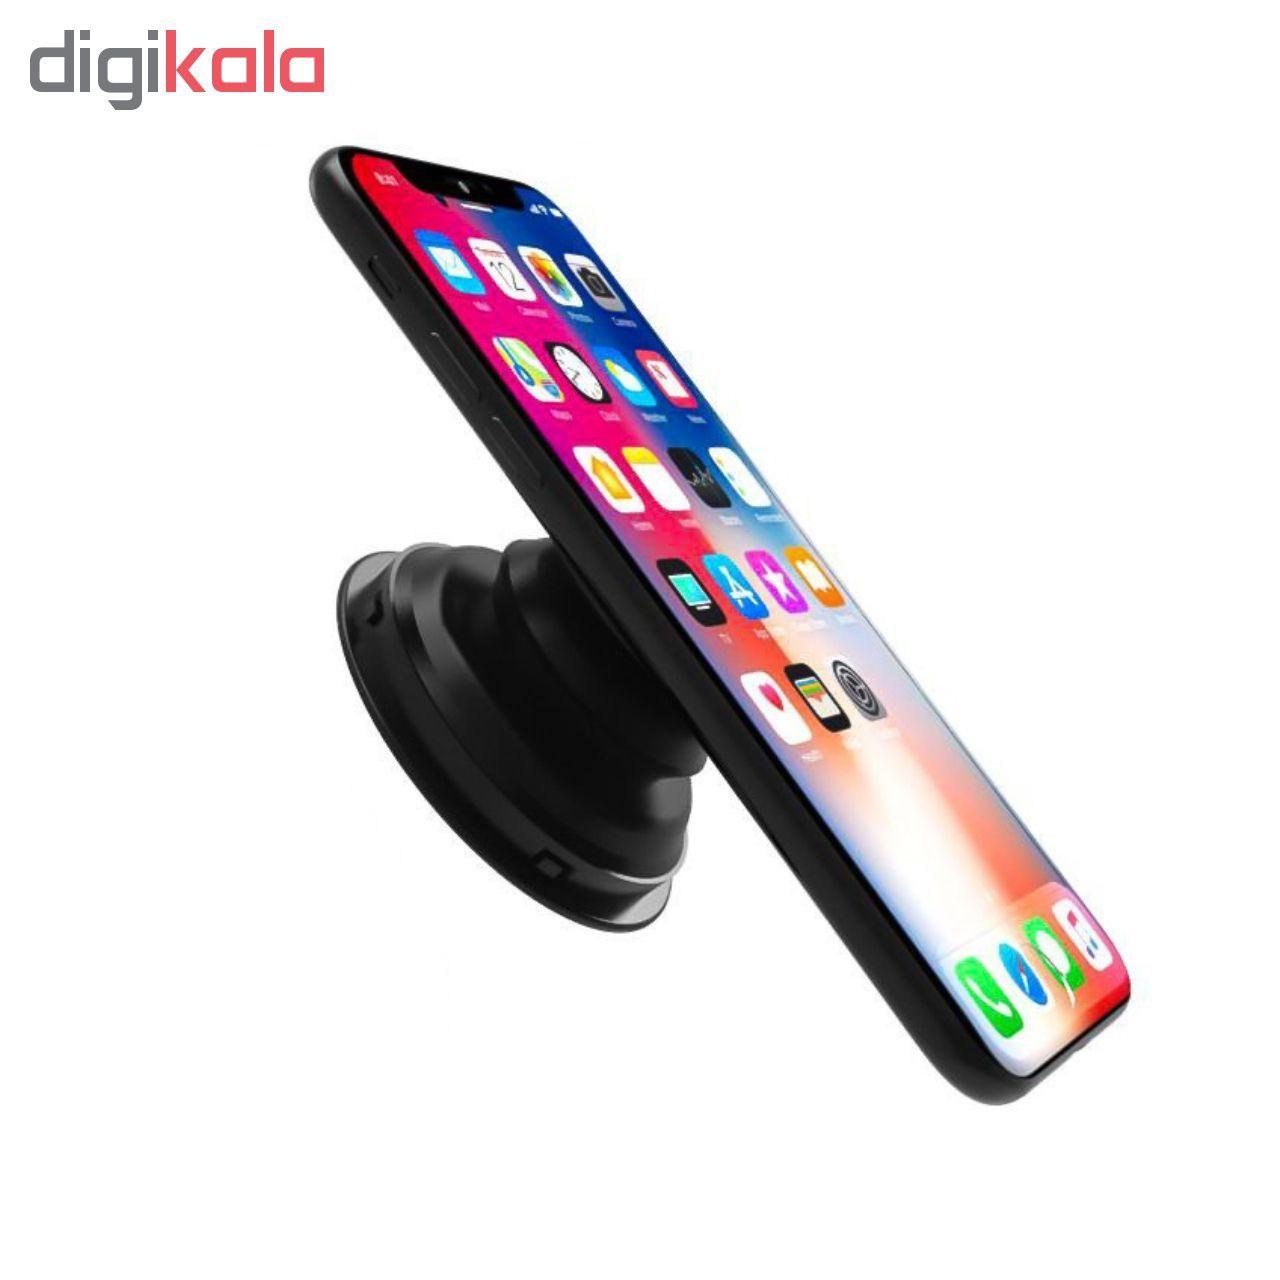 پایه نگهدارنده گوشی موبایل پاپ سوکت آکام مدل APS0286 main 1 8